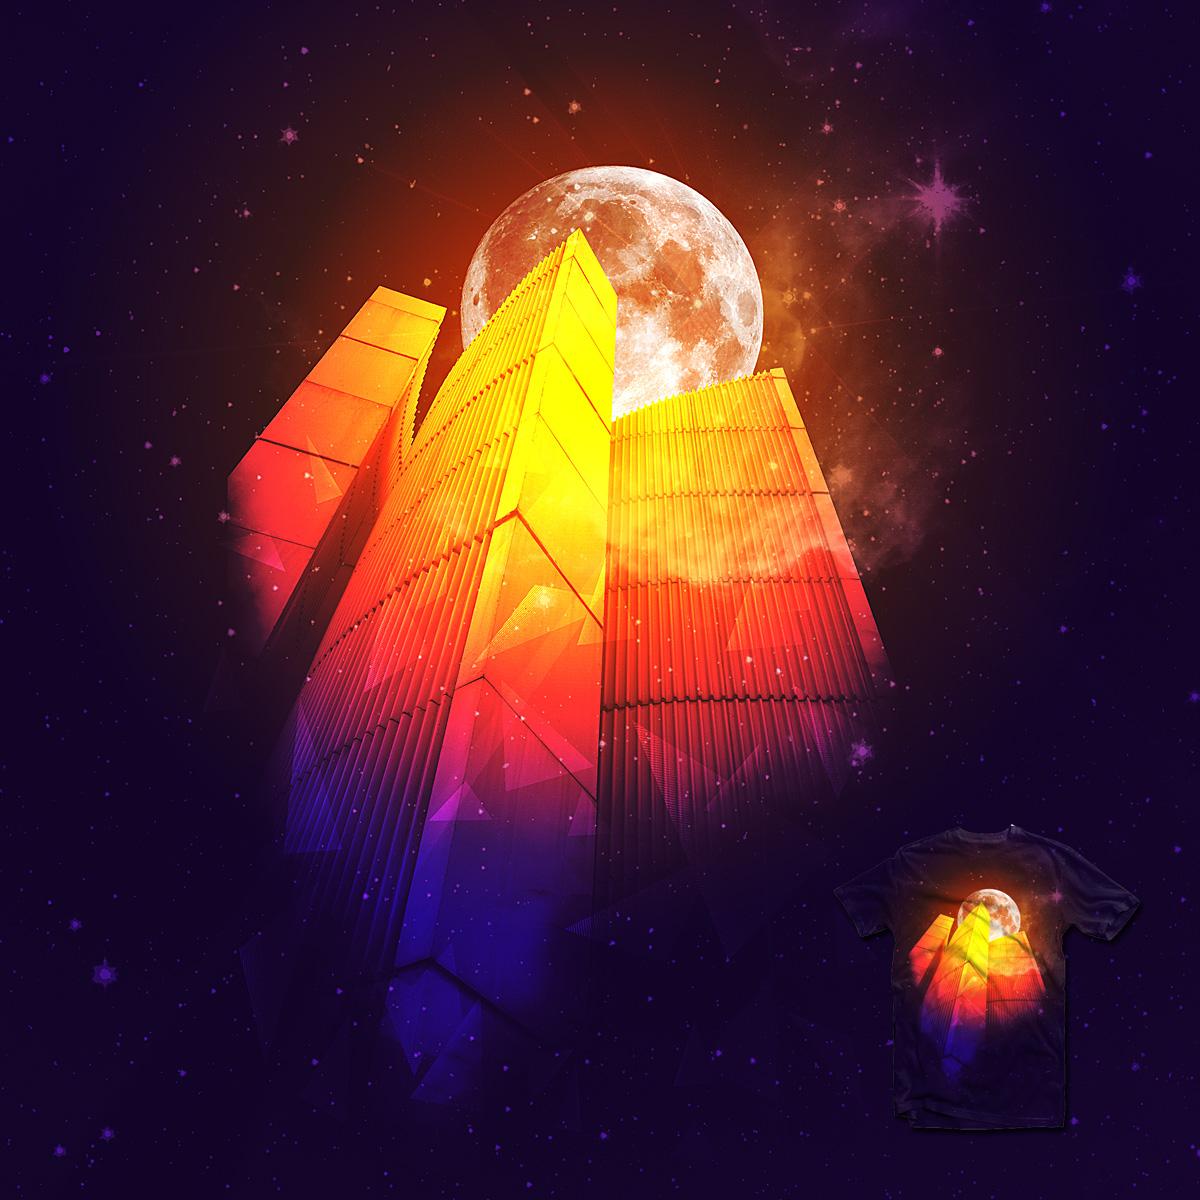 The Summit by rizkisyahril on Threadless